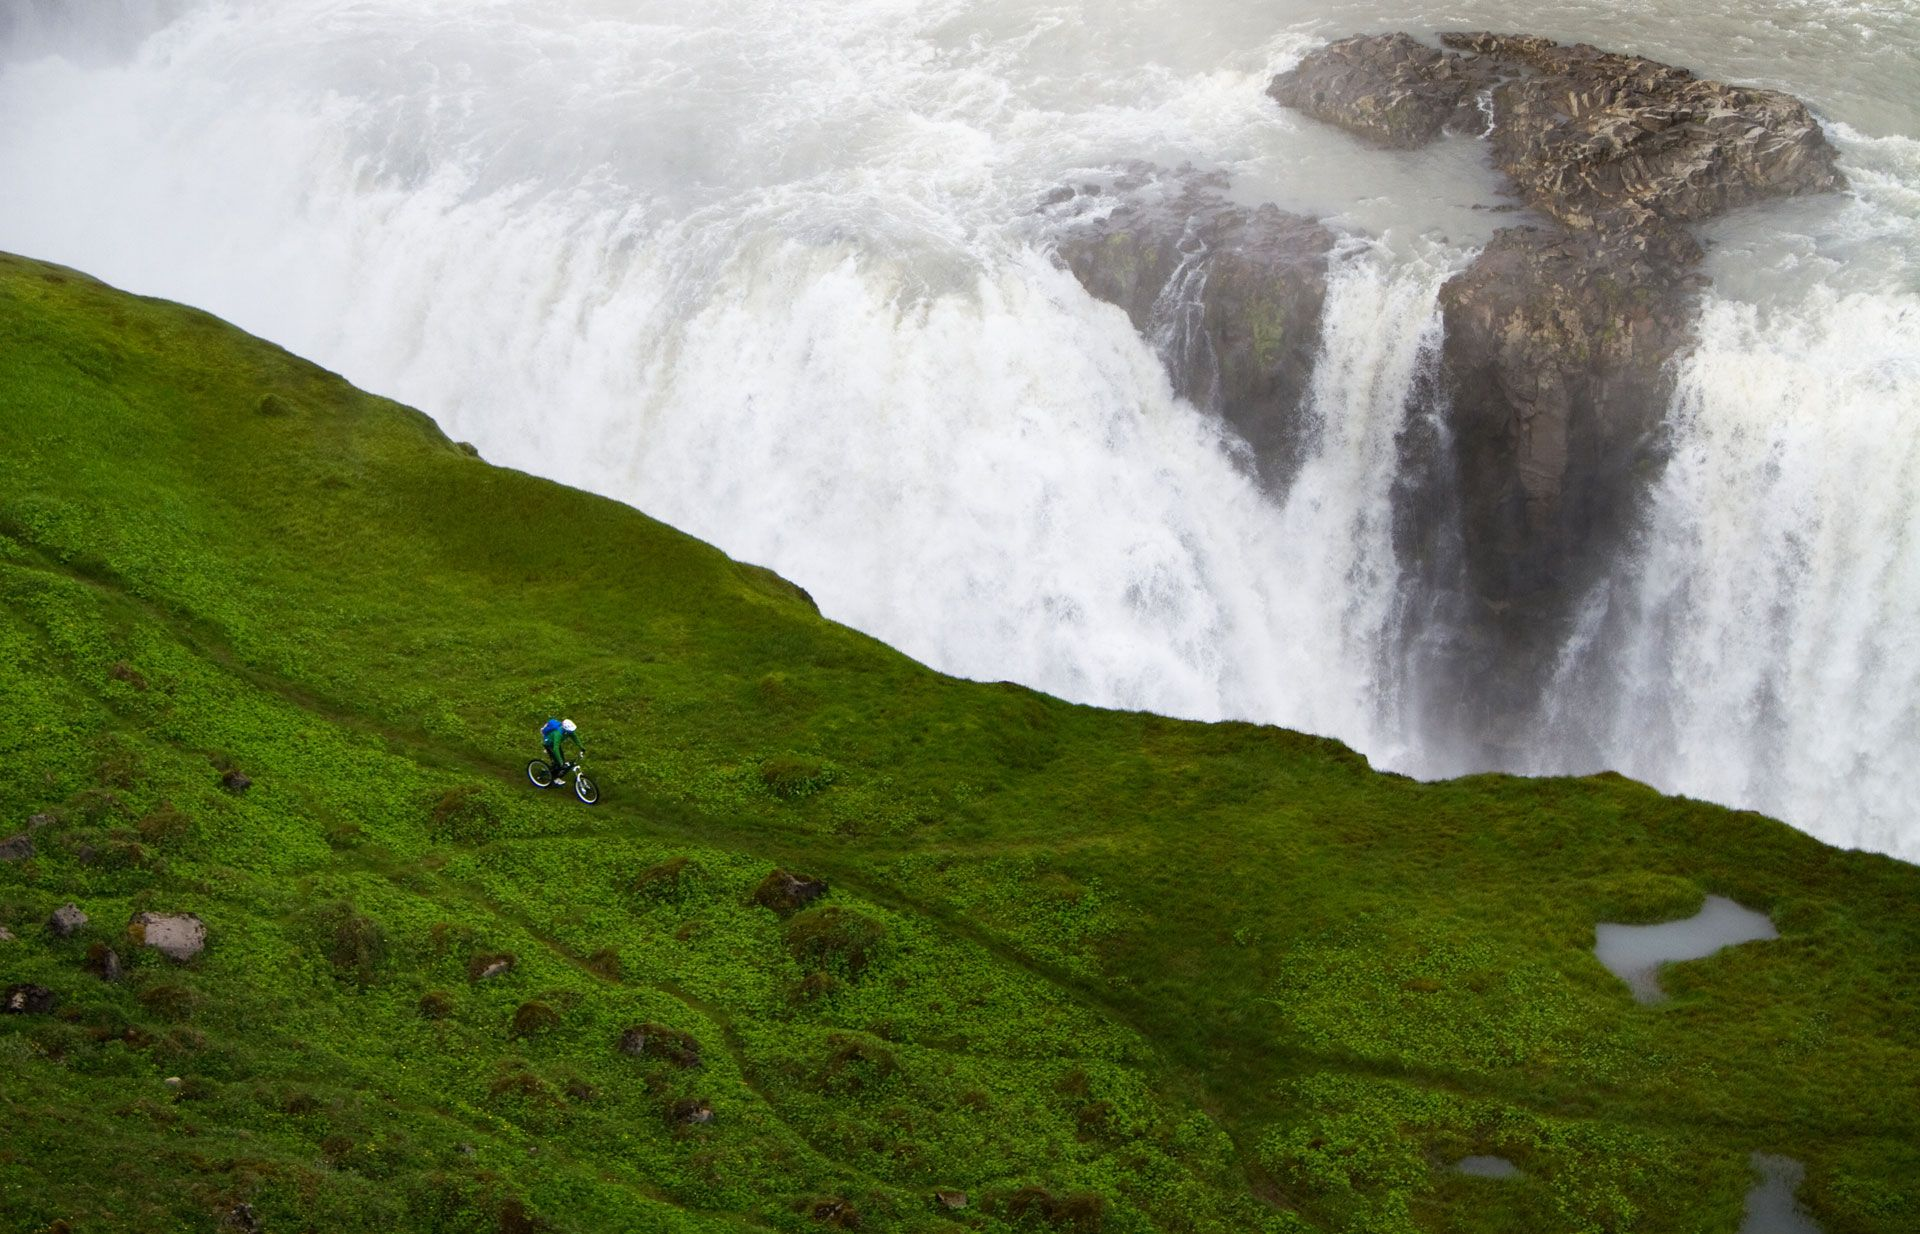 Mountainbiking in Iceland, close to Gullfoss Waterfall - Bastian Morell (Wallpaper Download)